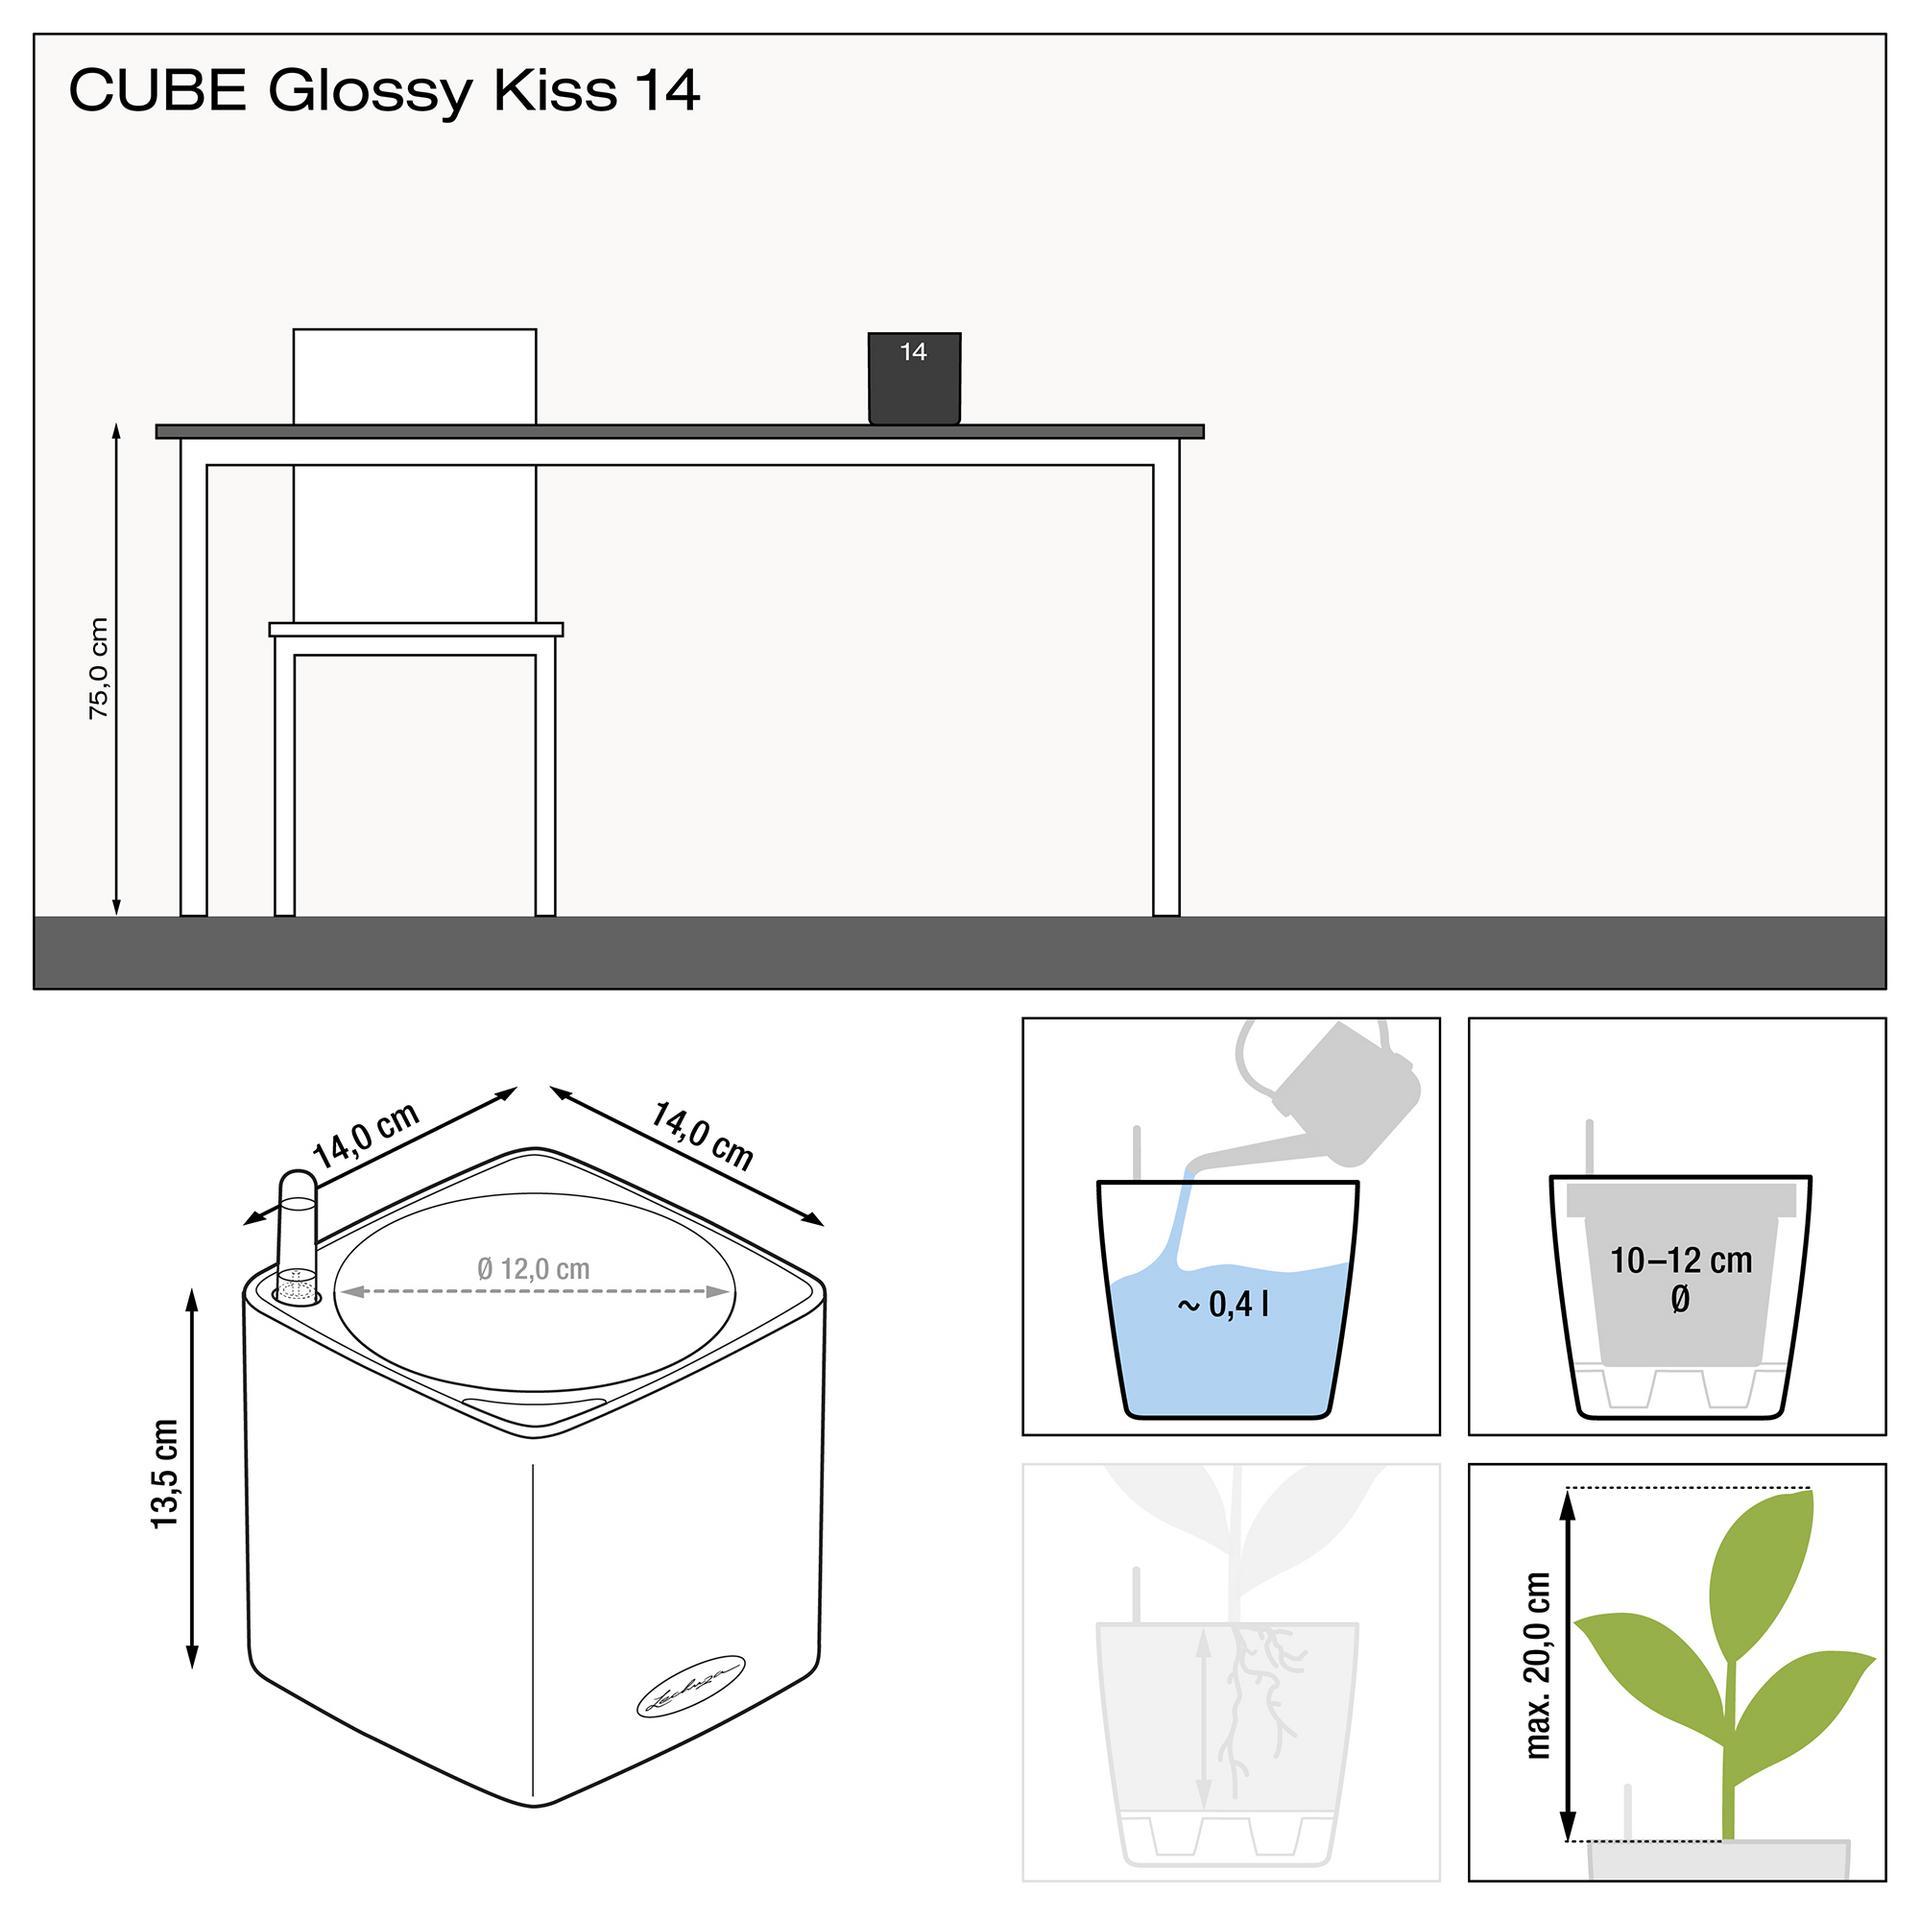 le_cube-glossy-kiss14_product_addi_nz